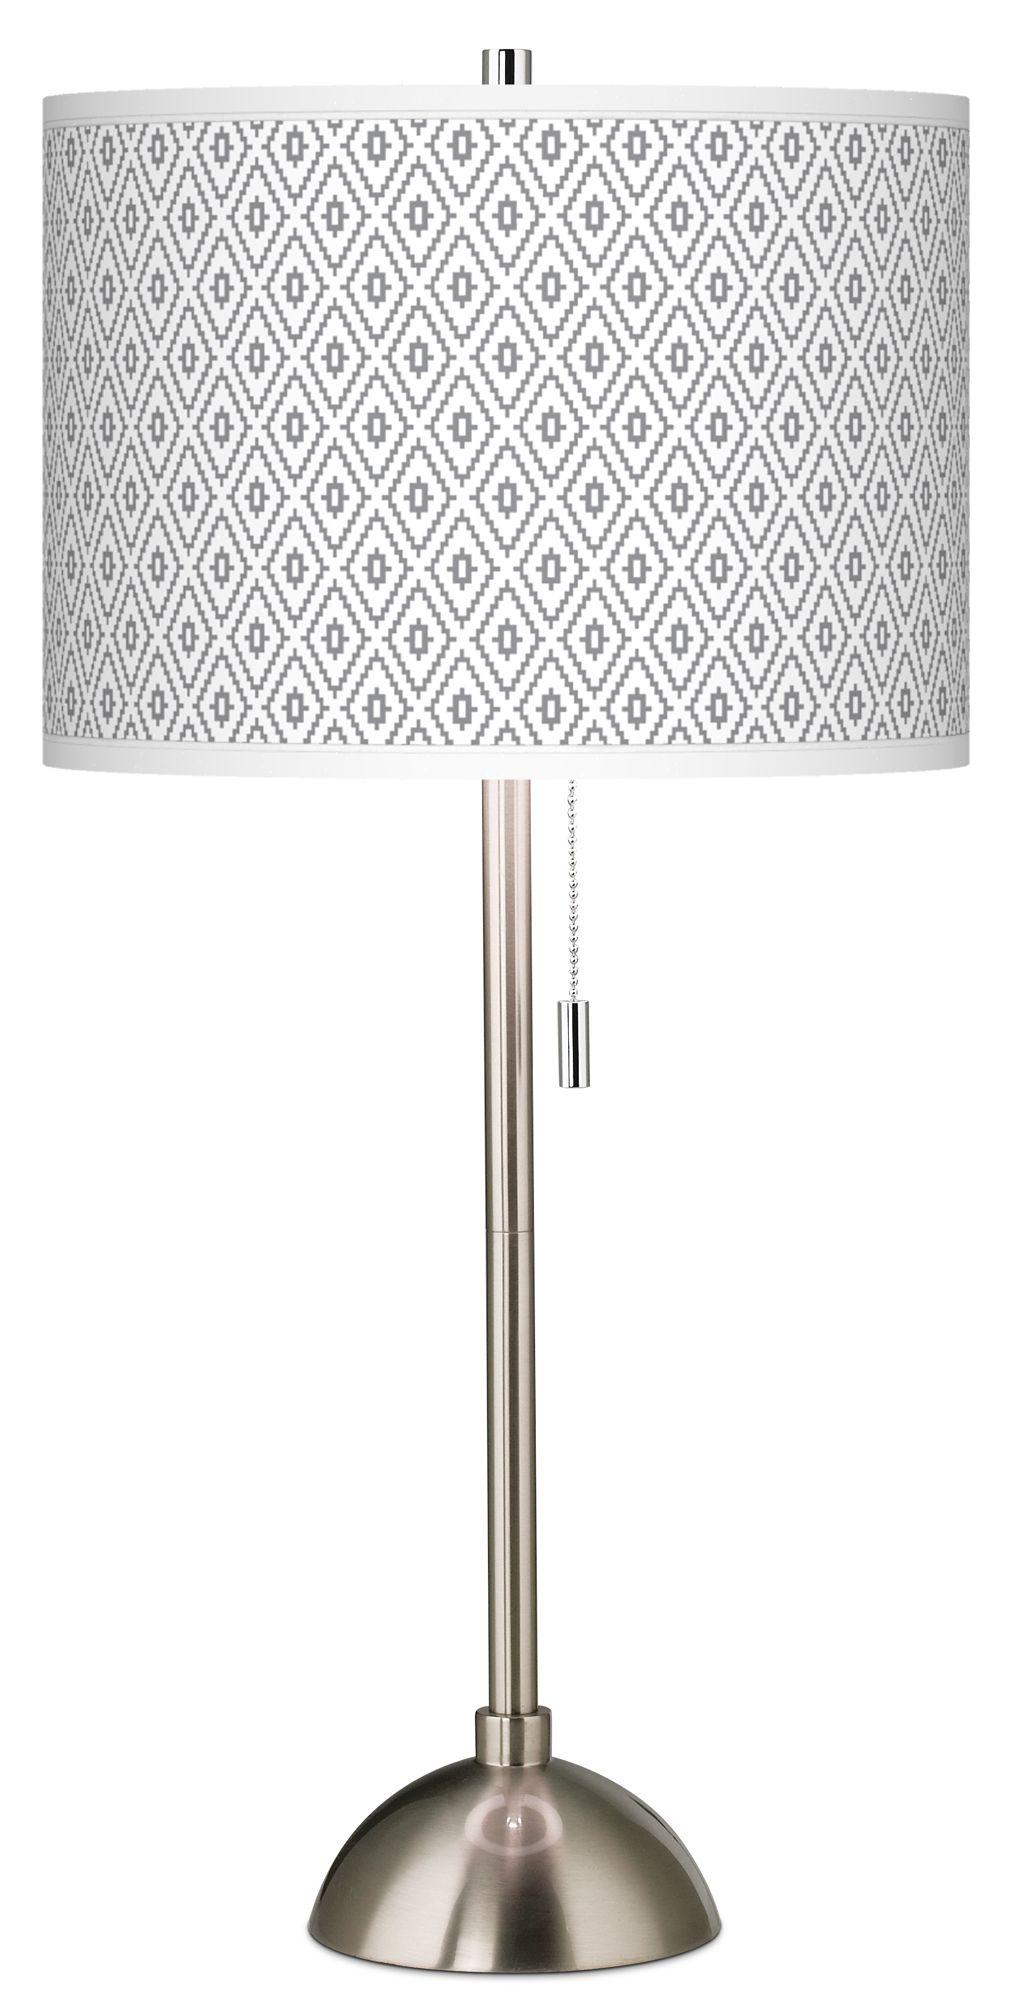 Diamonds Giclee Brushed Steel Table Lamp